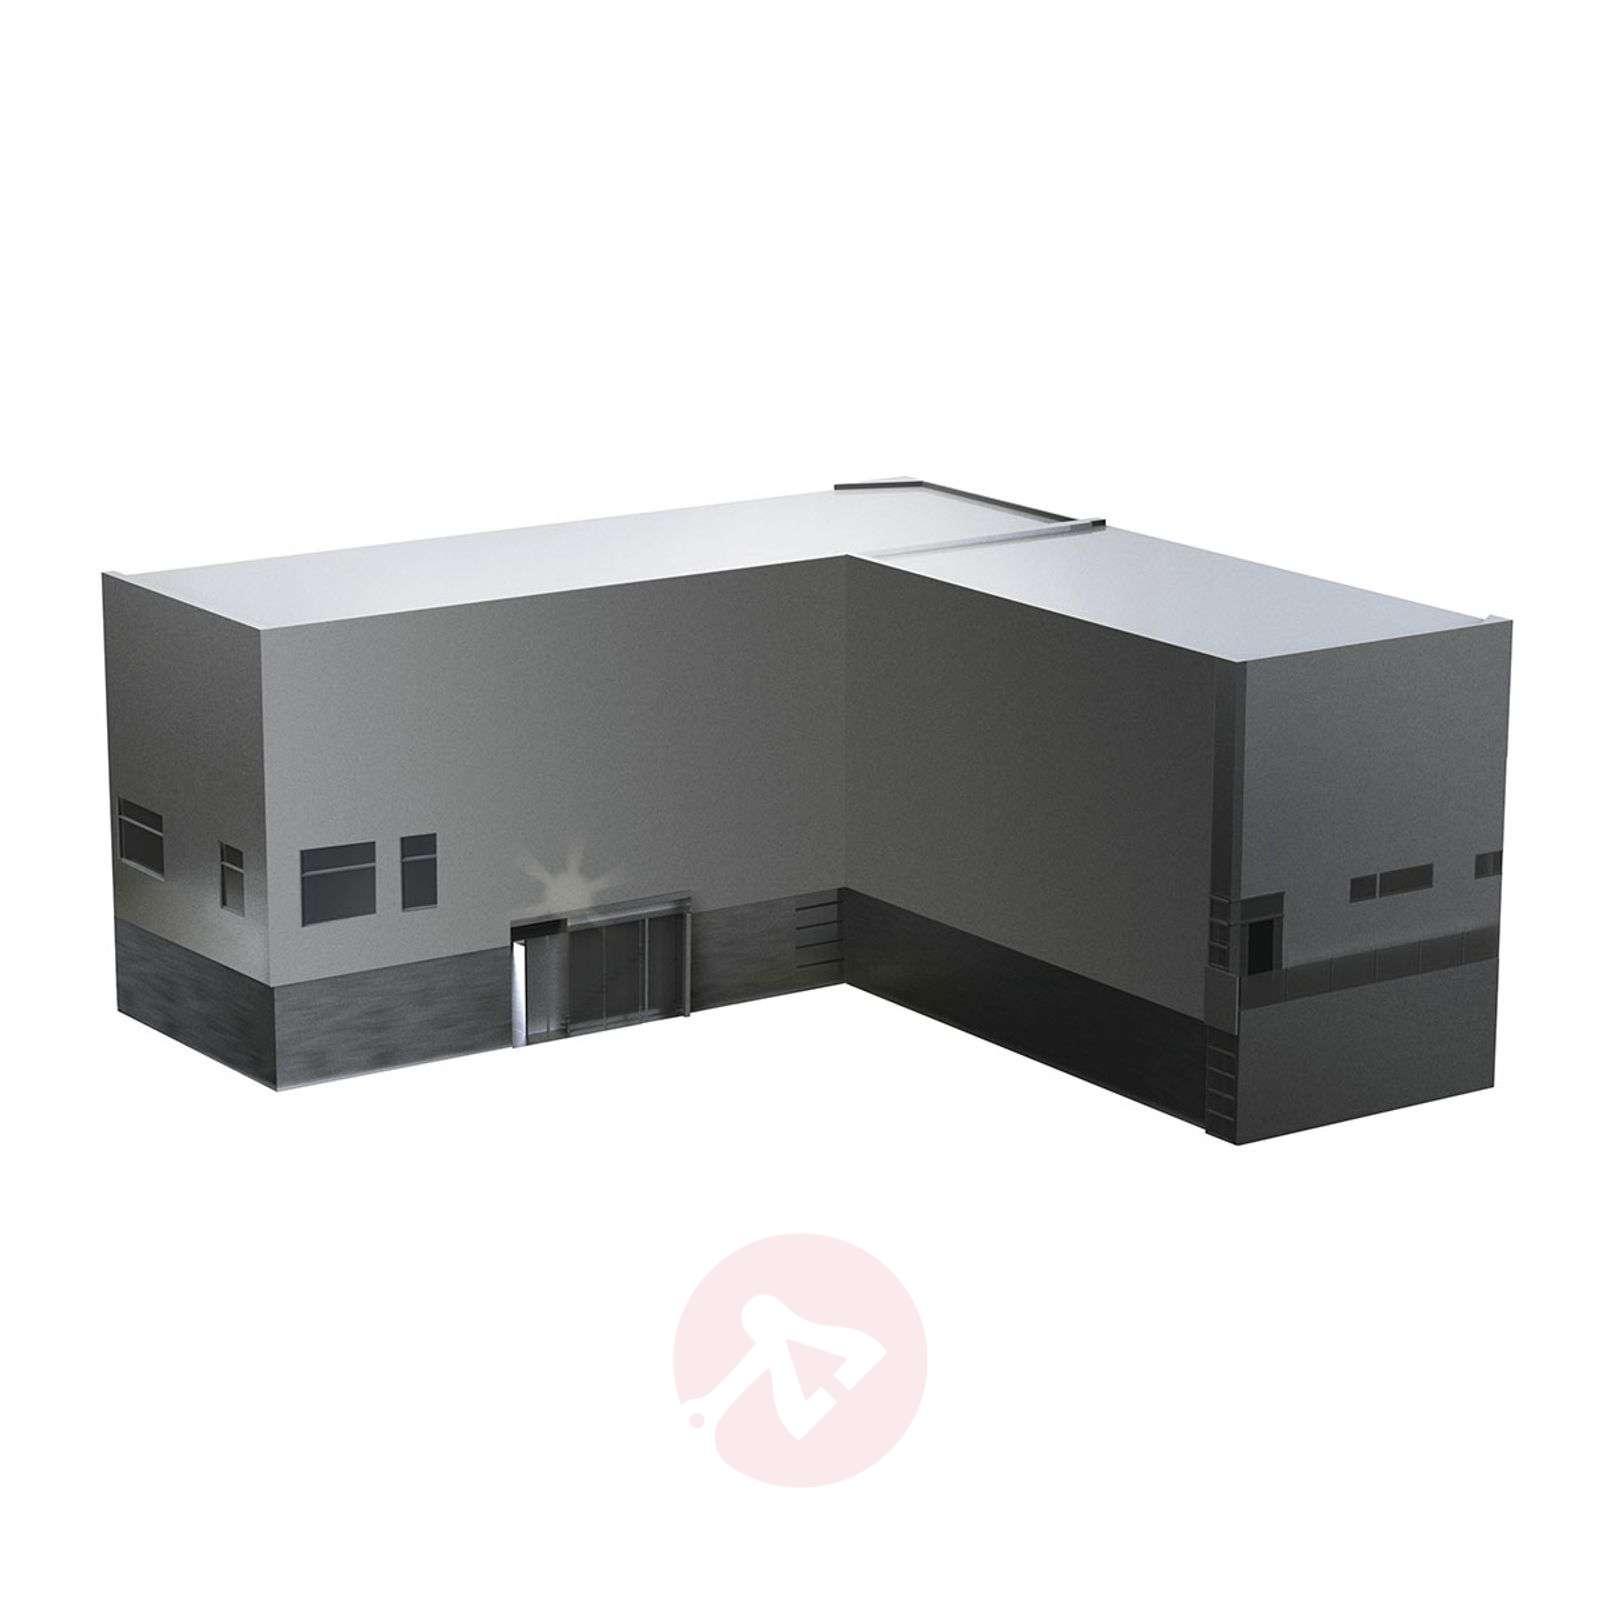 STEINEL XLED Pro Square SL XL kohdevalaisin ulos-8506074-01